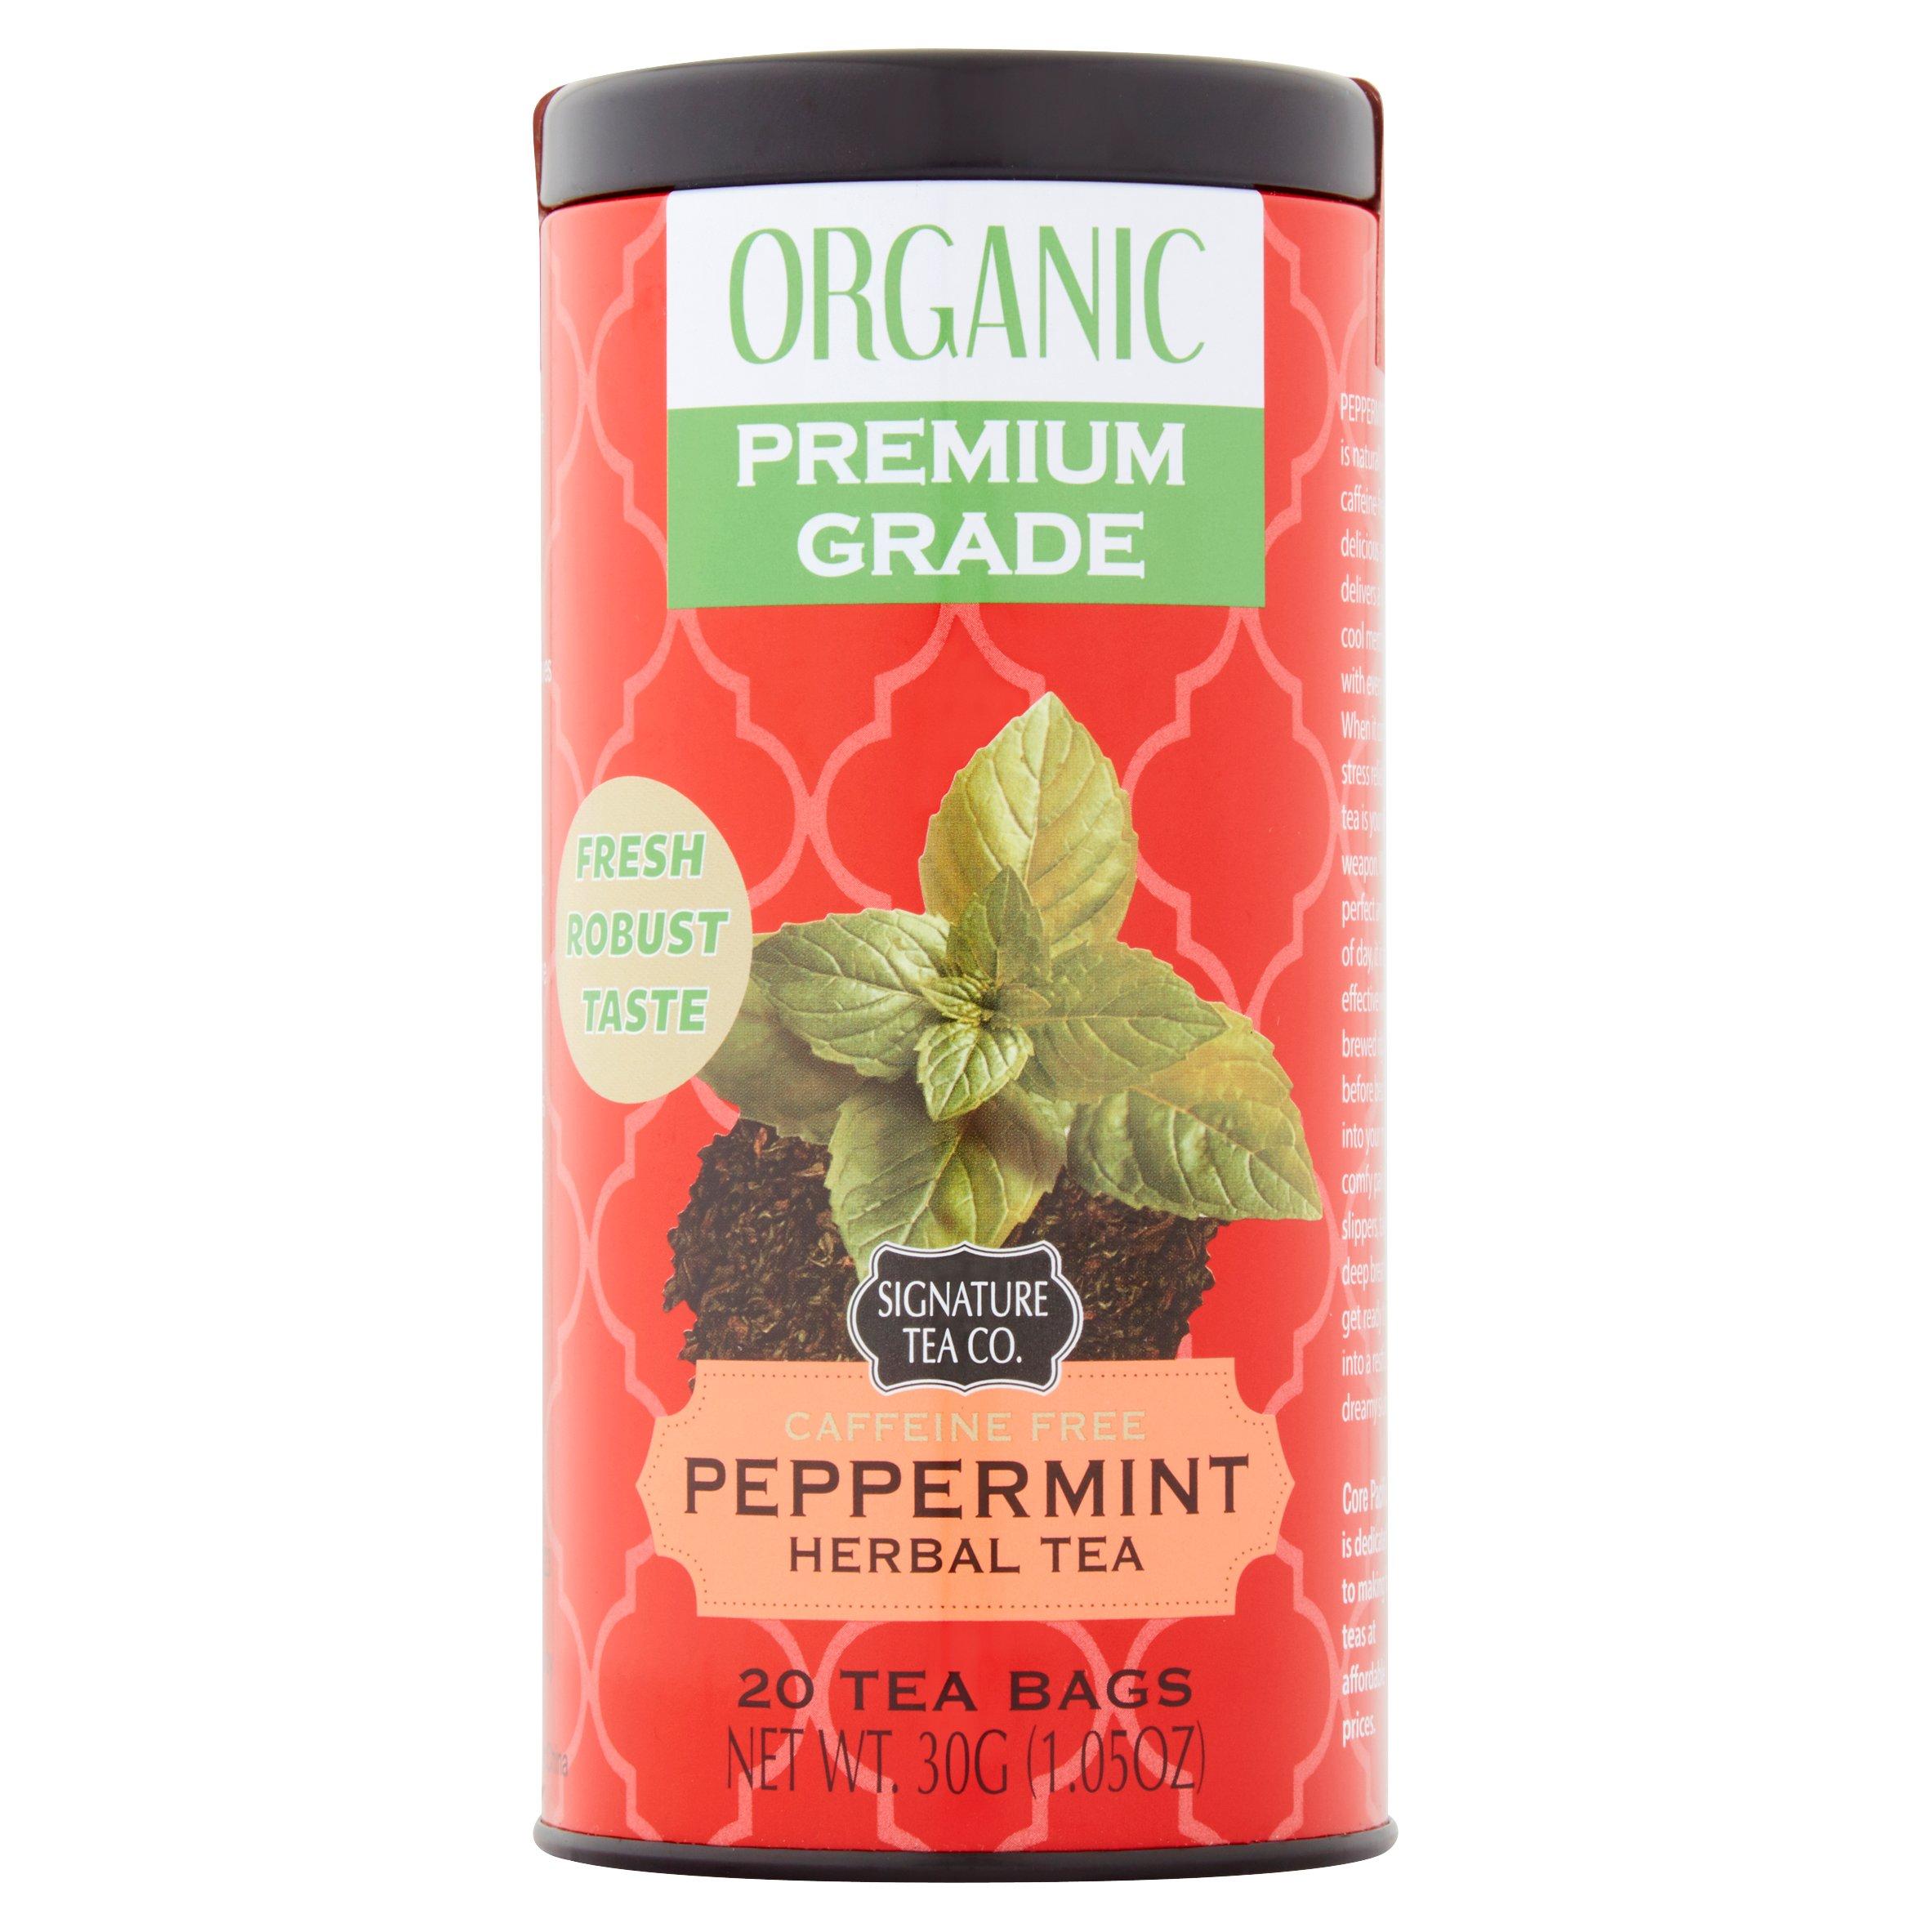 Core Pacific Inc. Signature Tea Co. Organic Peppermint Herbal Tea, 20 count, 1.05 oz